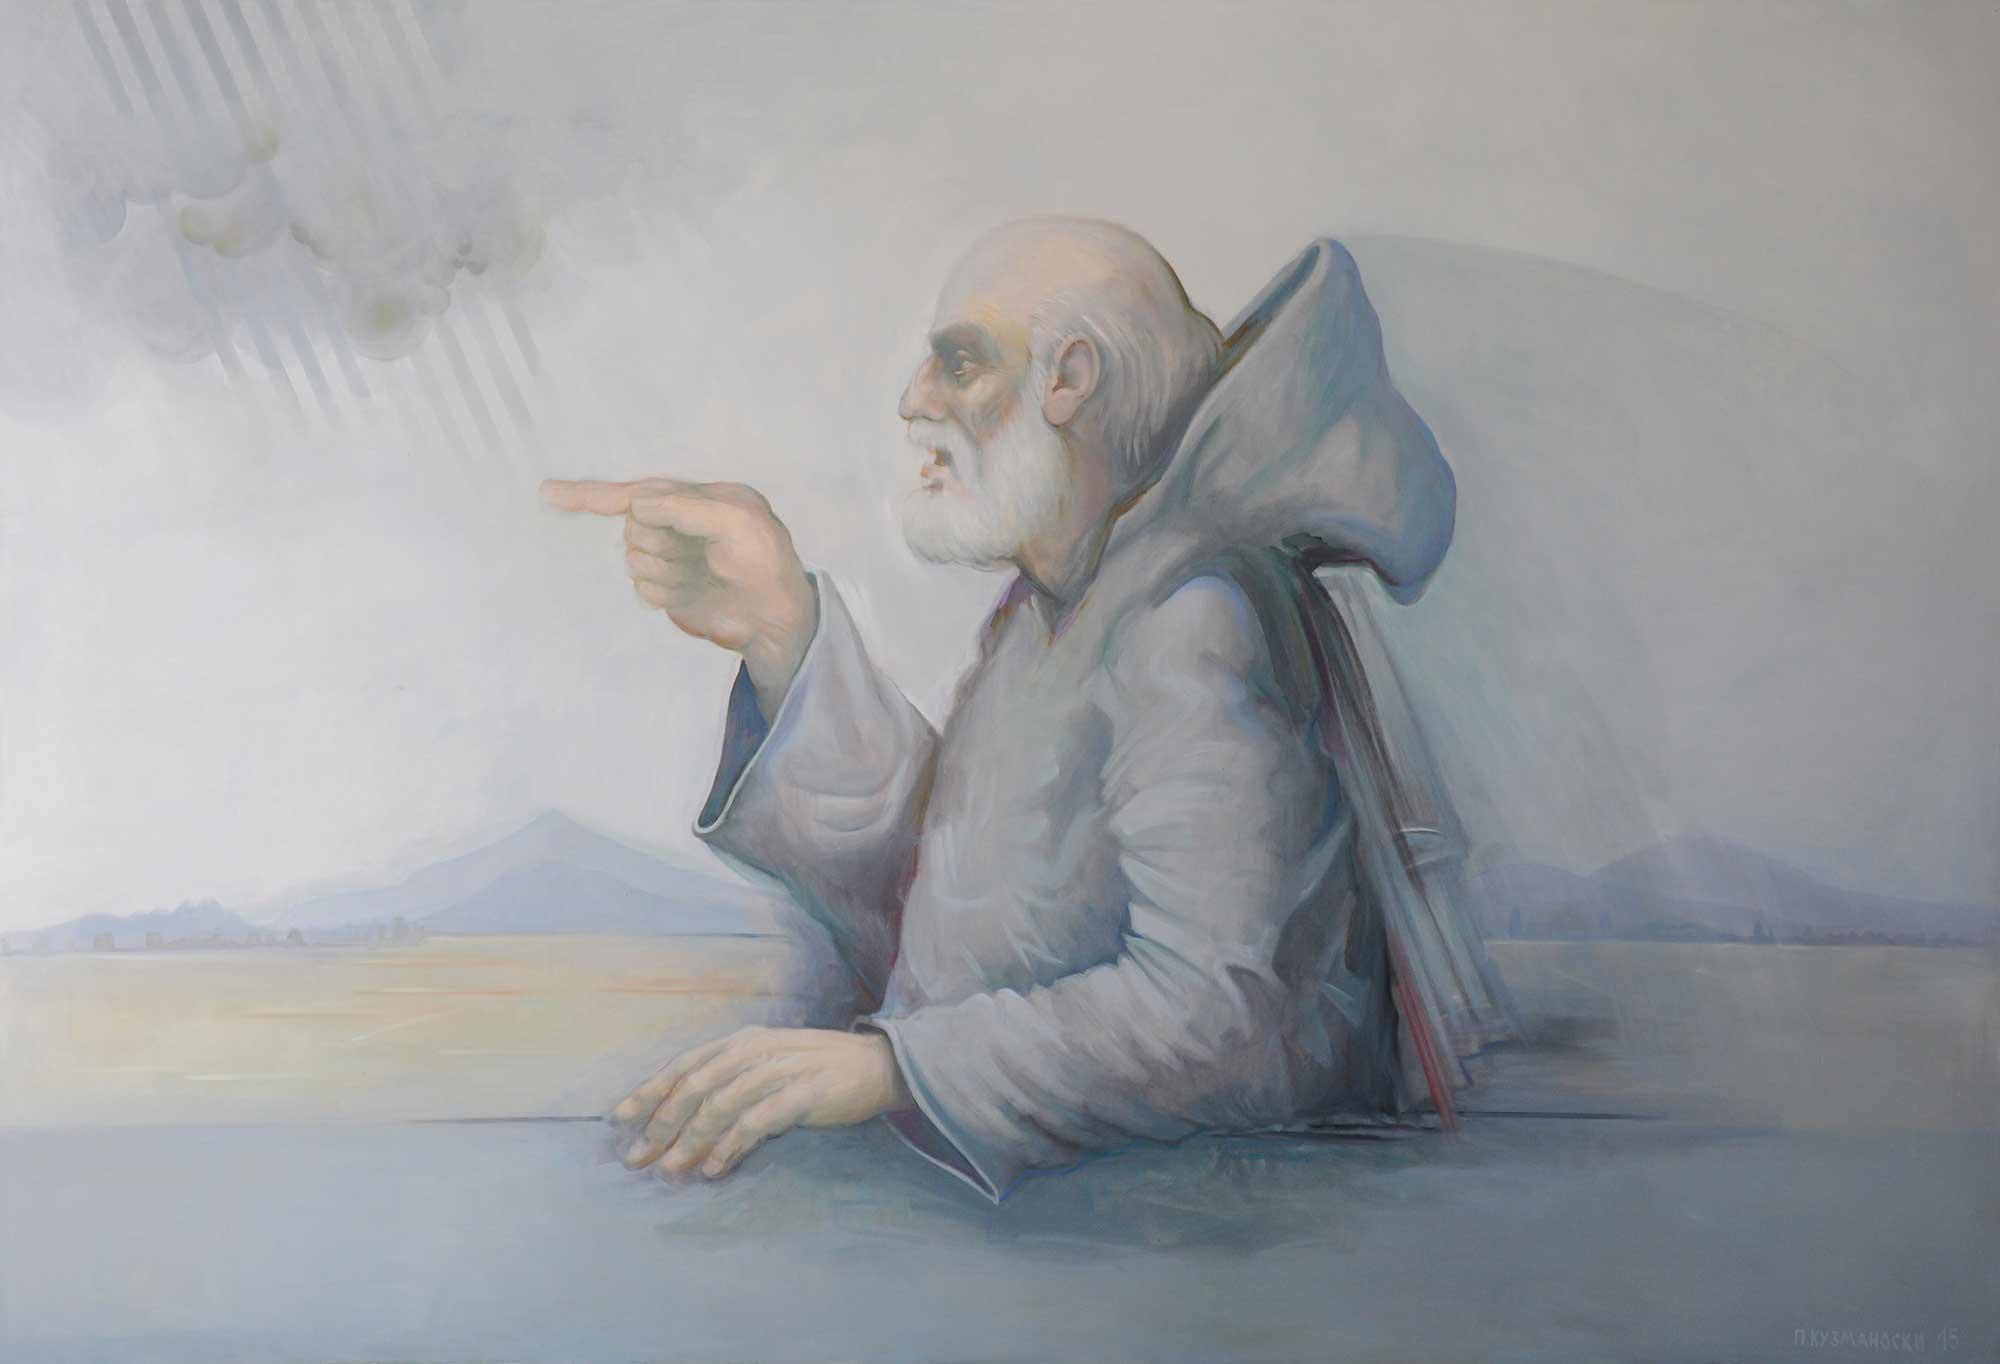 Pavle KUZMANOVSKI, Buried Witness, 2015, oil on canvas, 195 x 285 cm